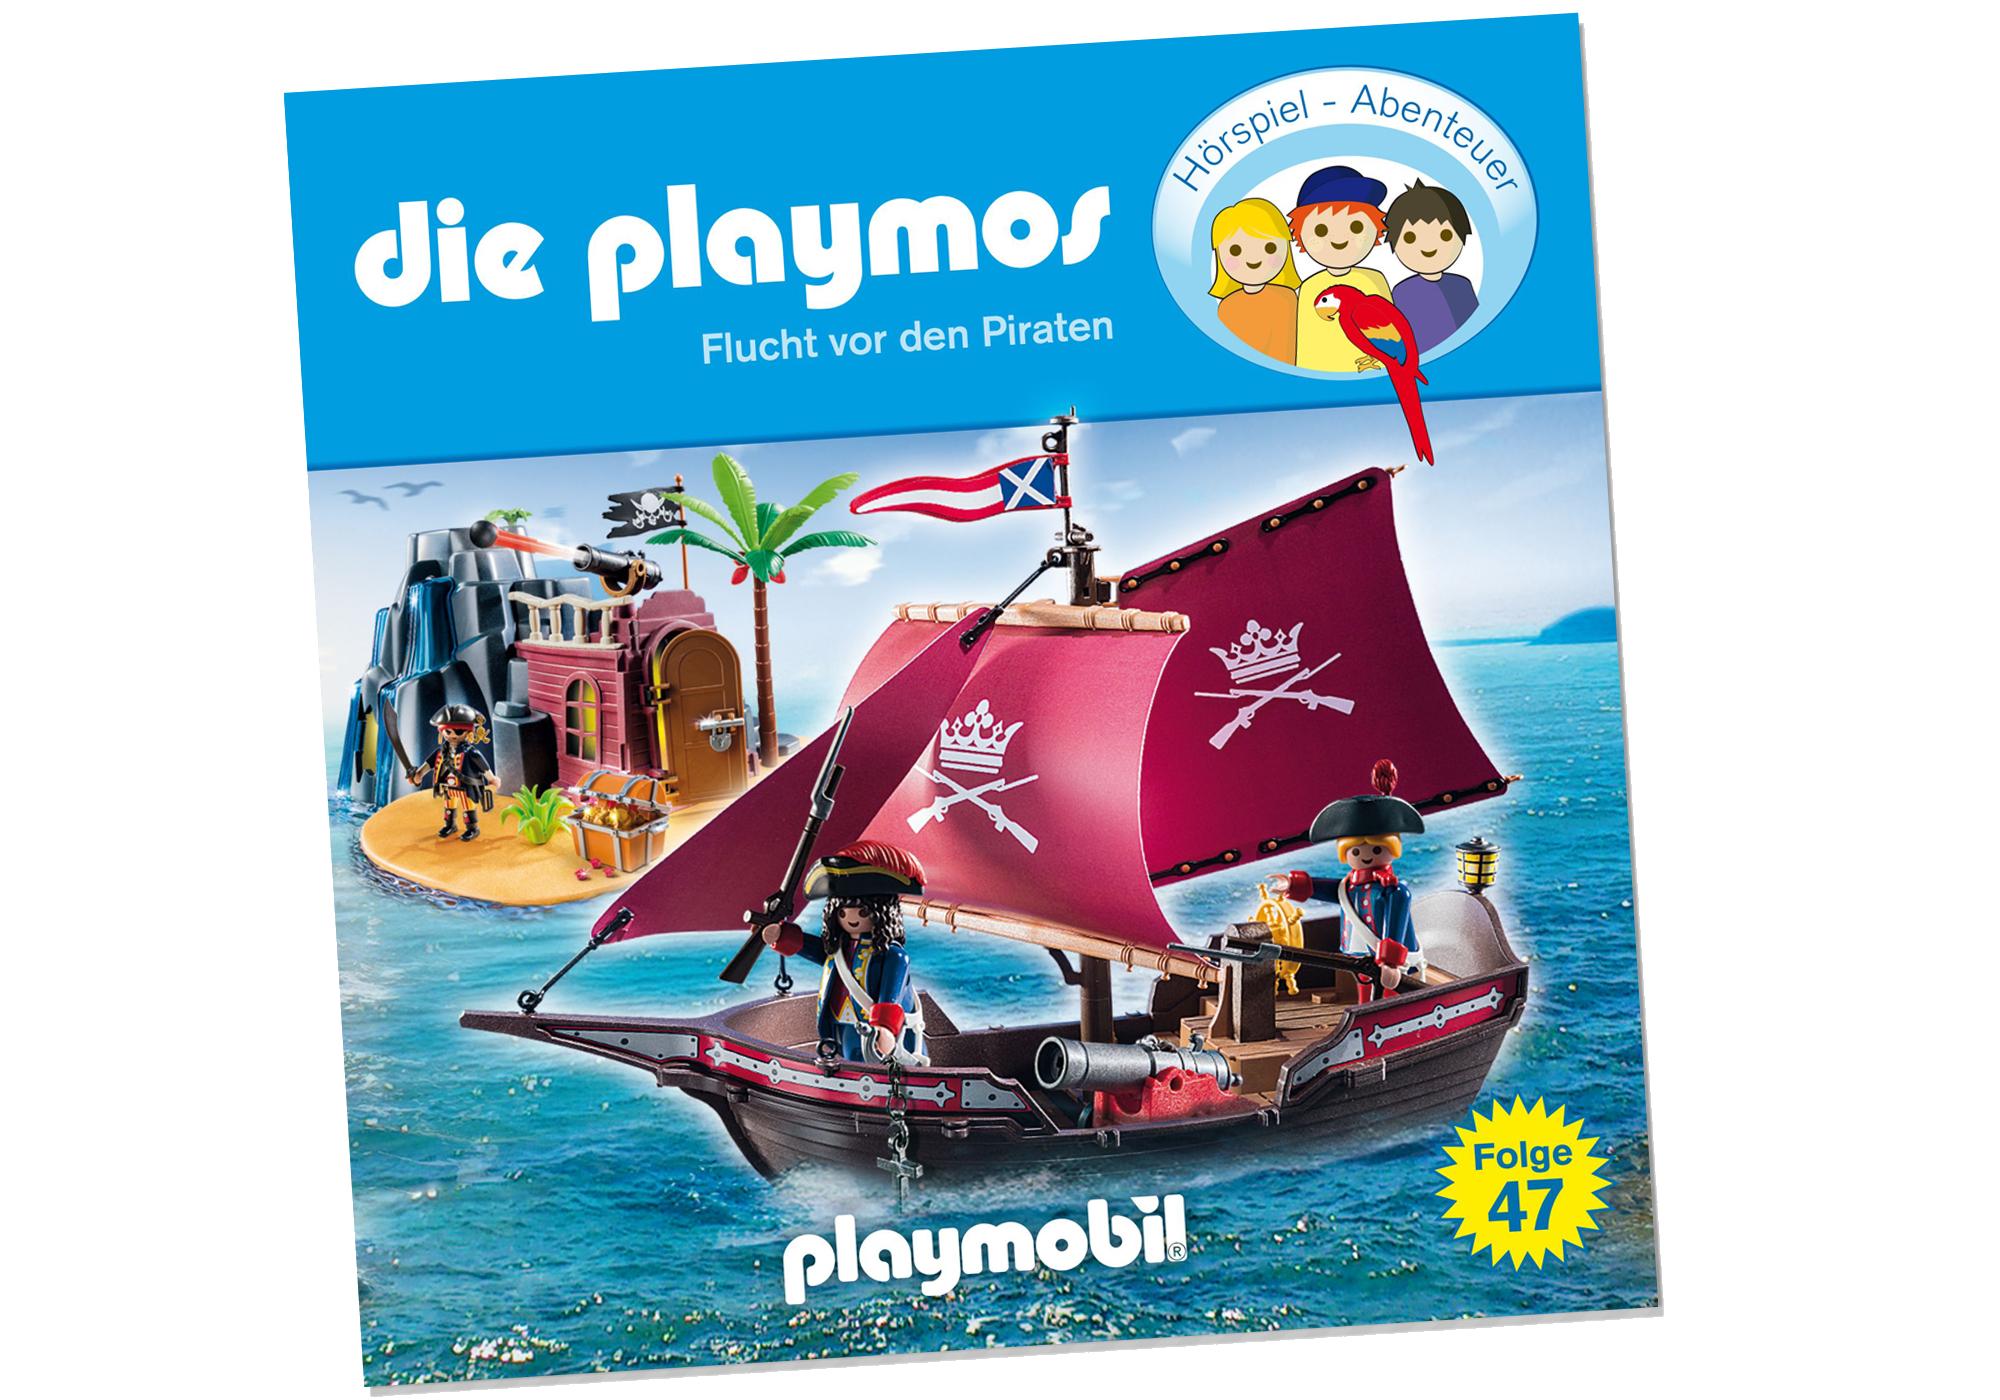 http://media.playmobil.com/i/playmobil/80254_product_detail